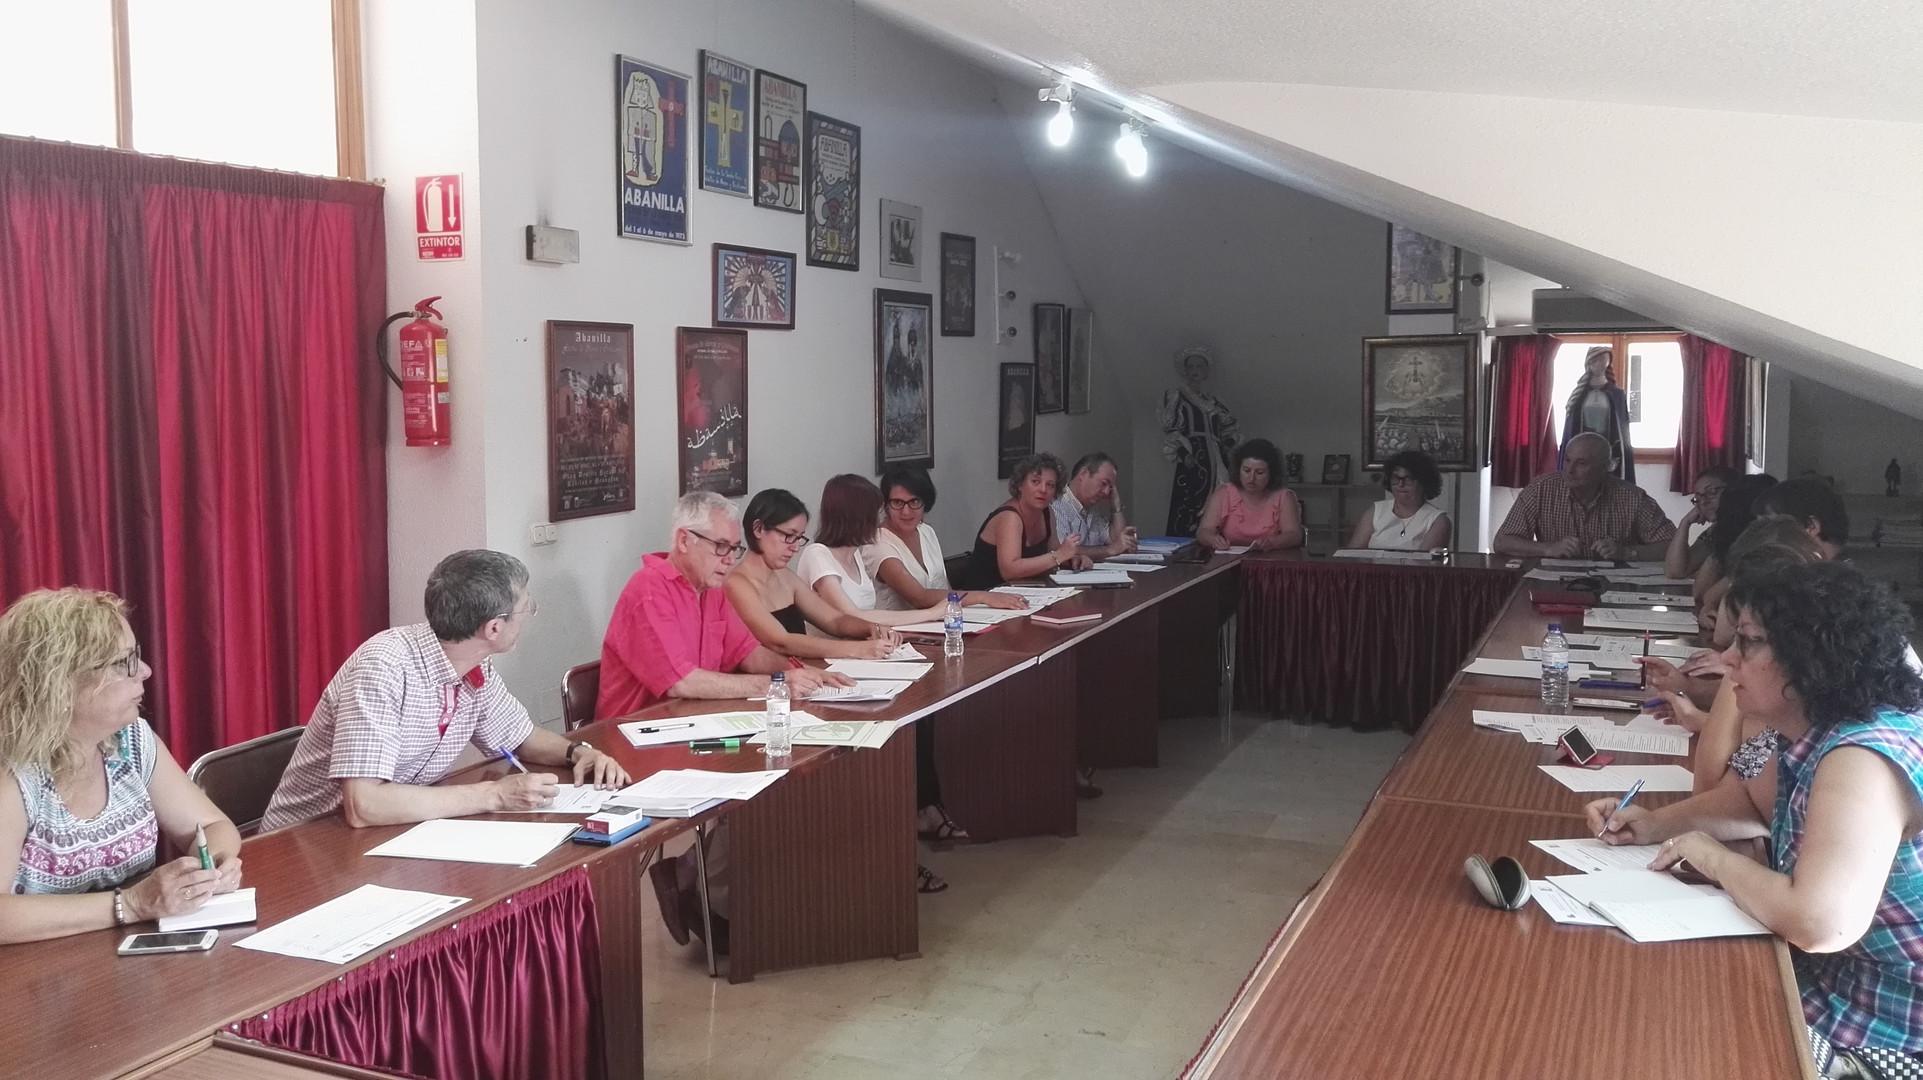 Abanilla. Junta Directiva y Asamblea EDLP-NORDESTE